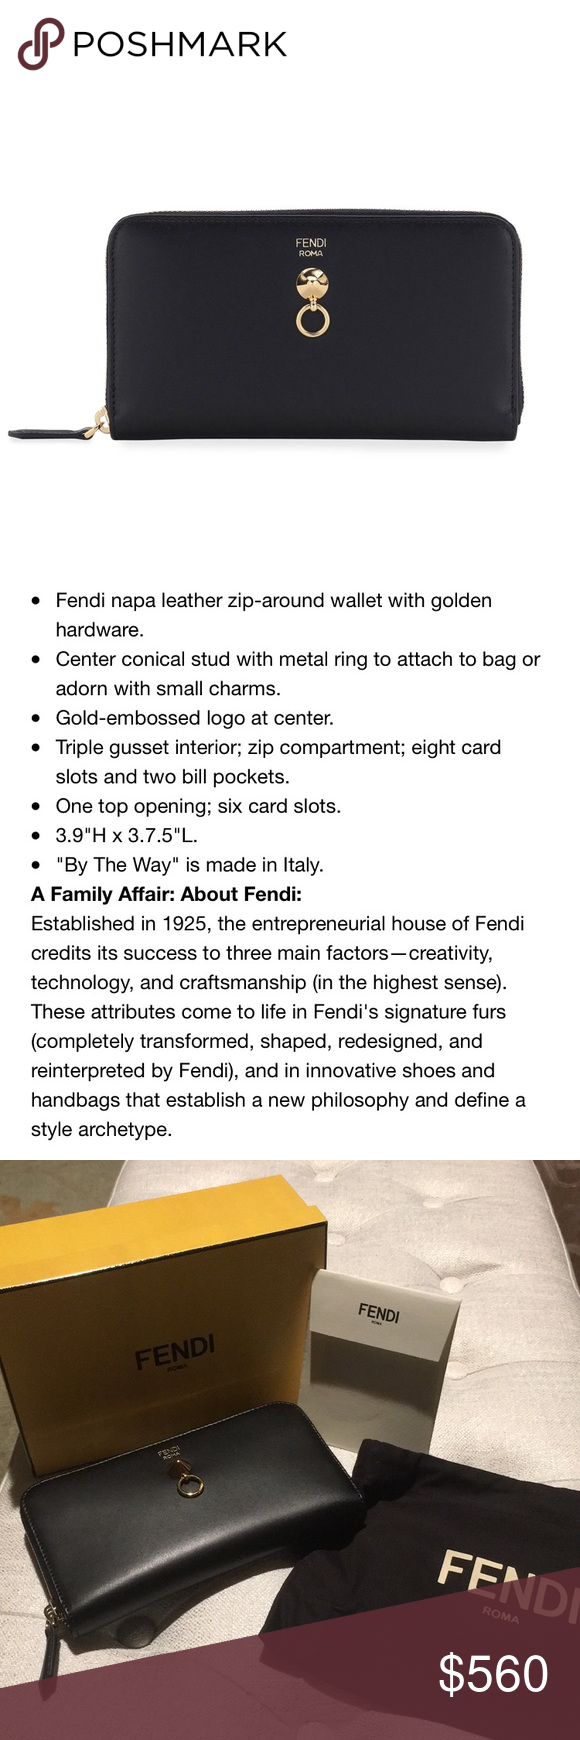 italy fendi bag roma numismatics ltd 640f7 210d3 49402df178